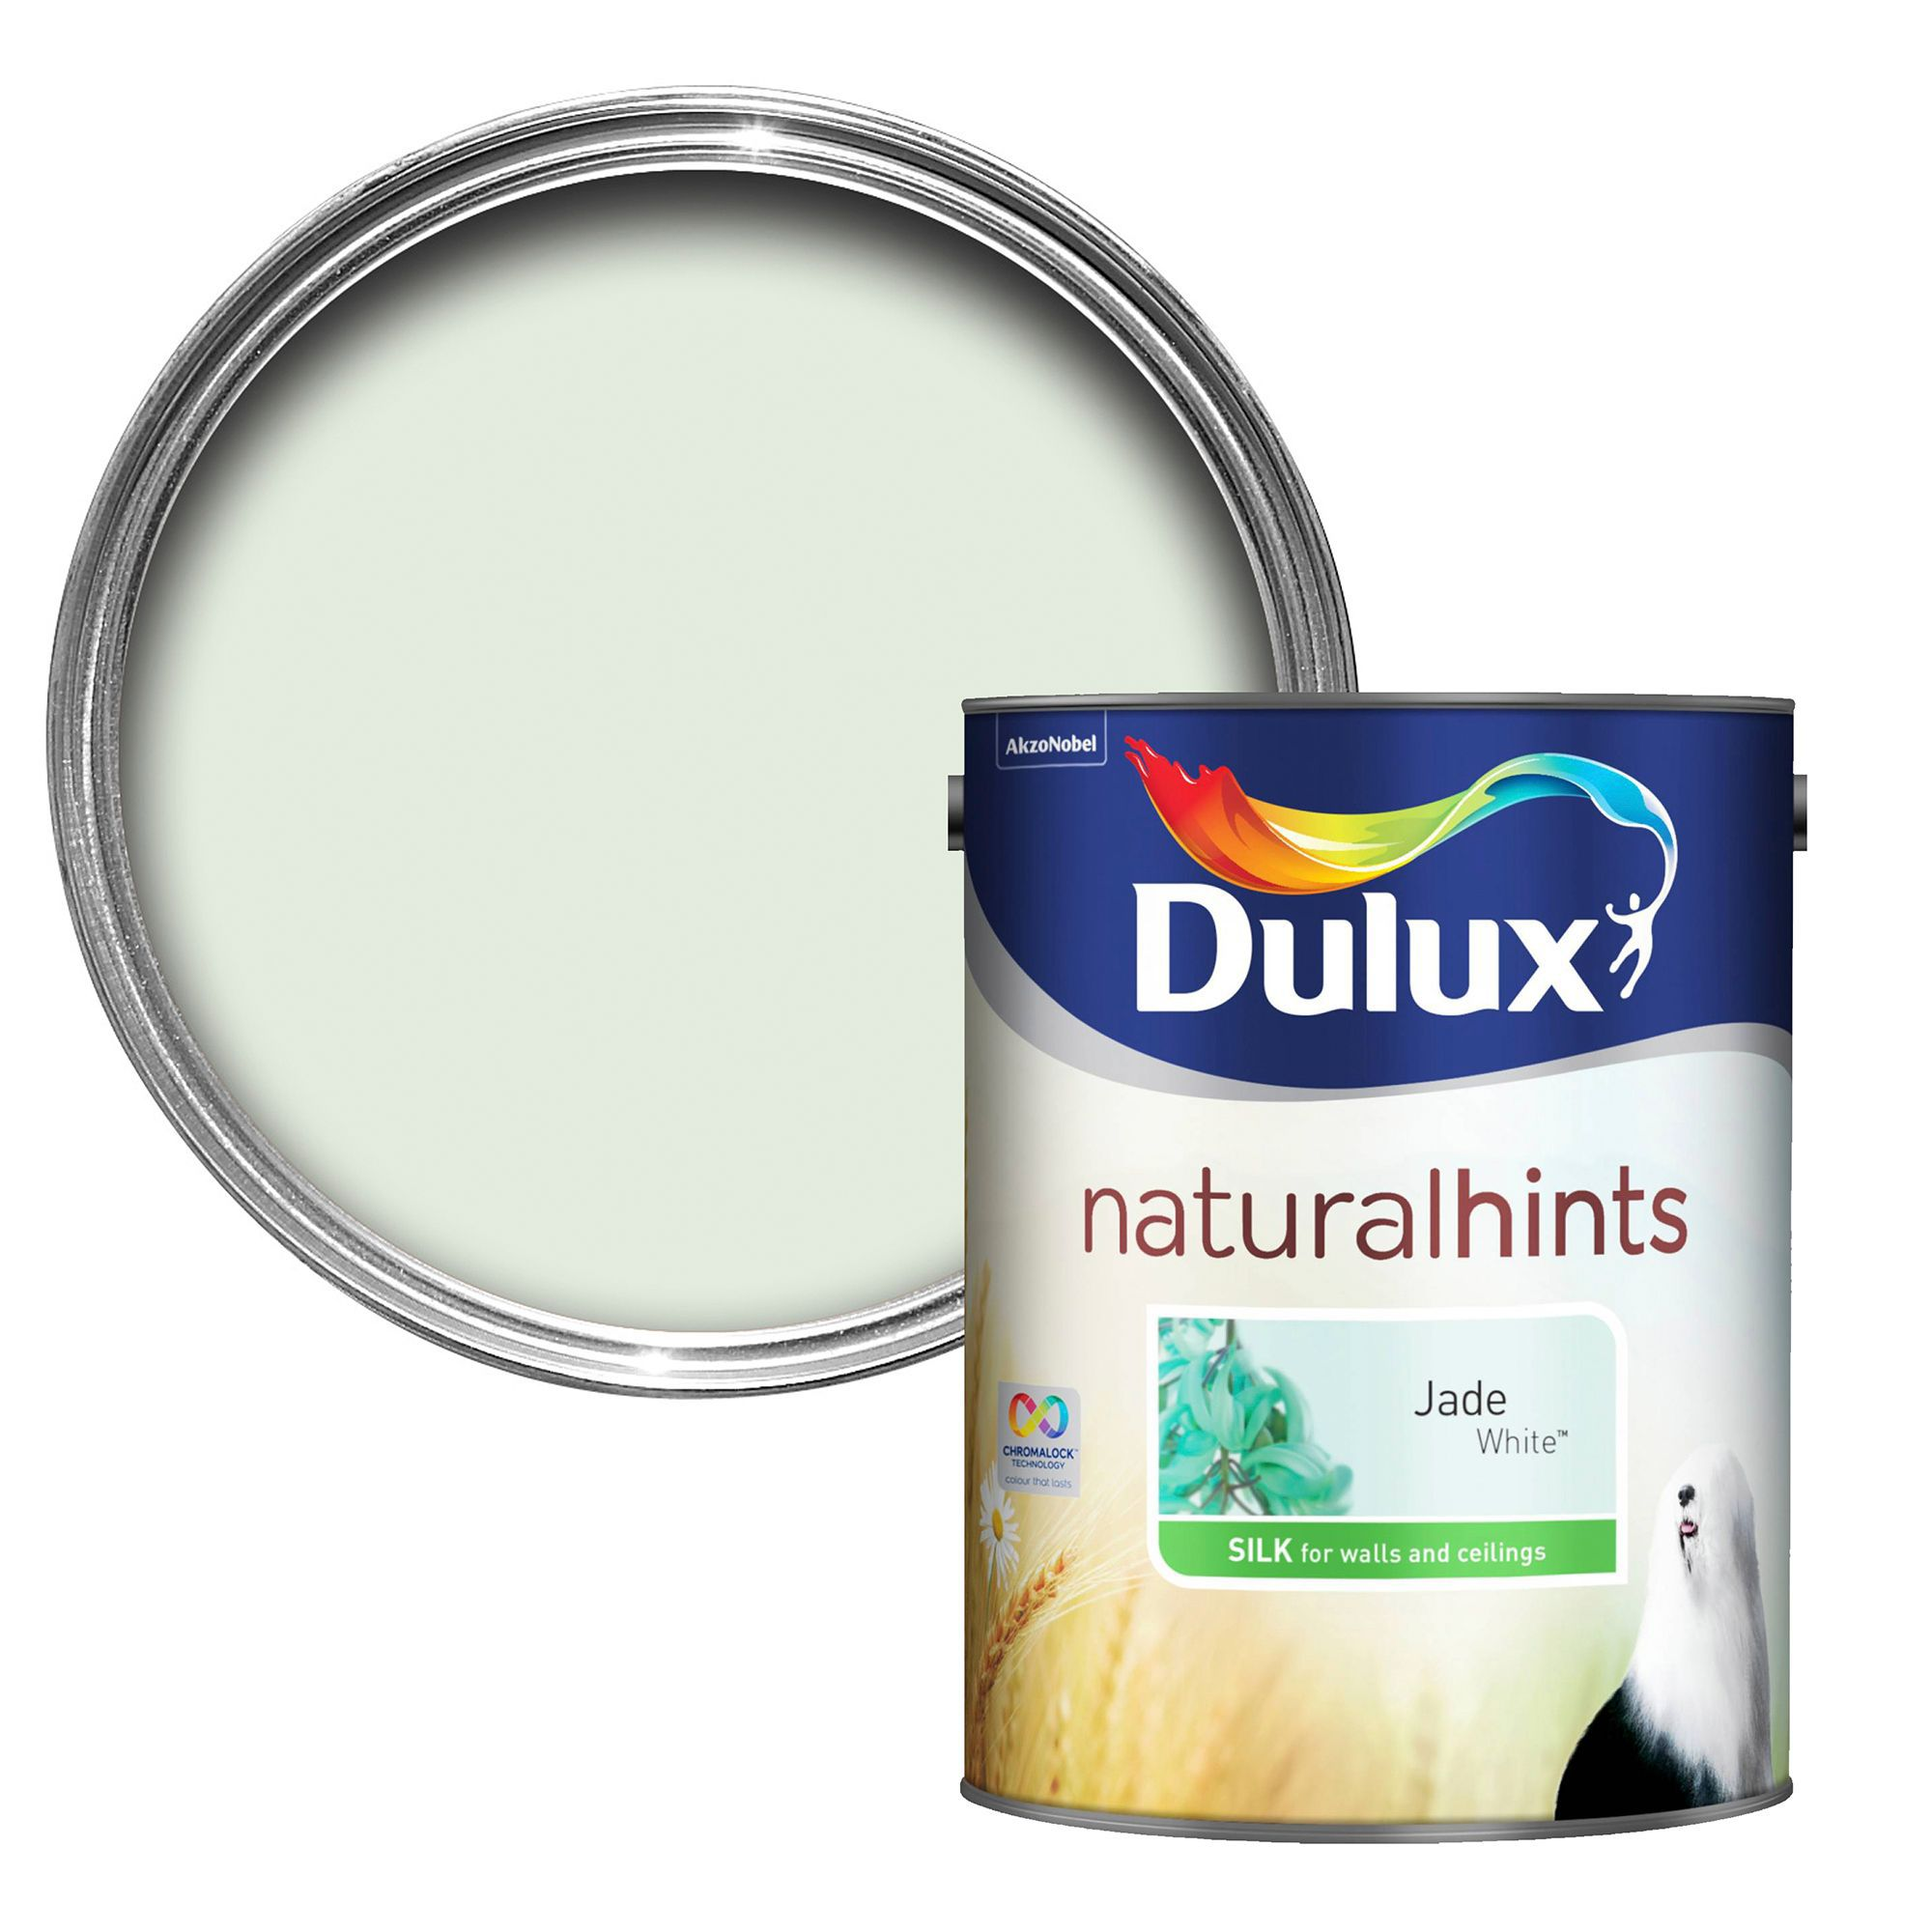 Dulux Luxurious Jade White Silk Emulsion Paint 5l Departments Diy At B Q